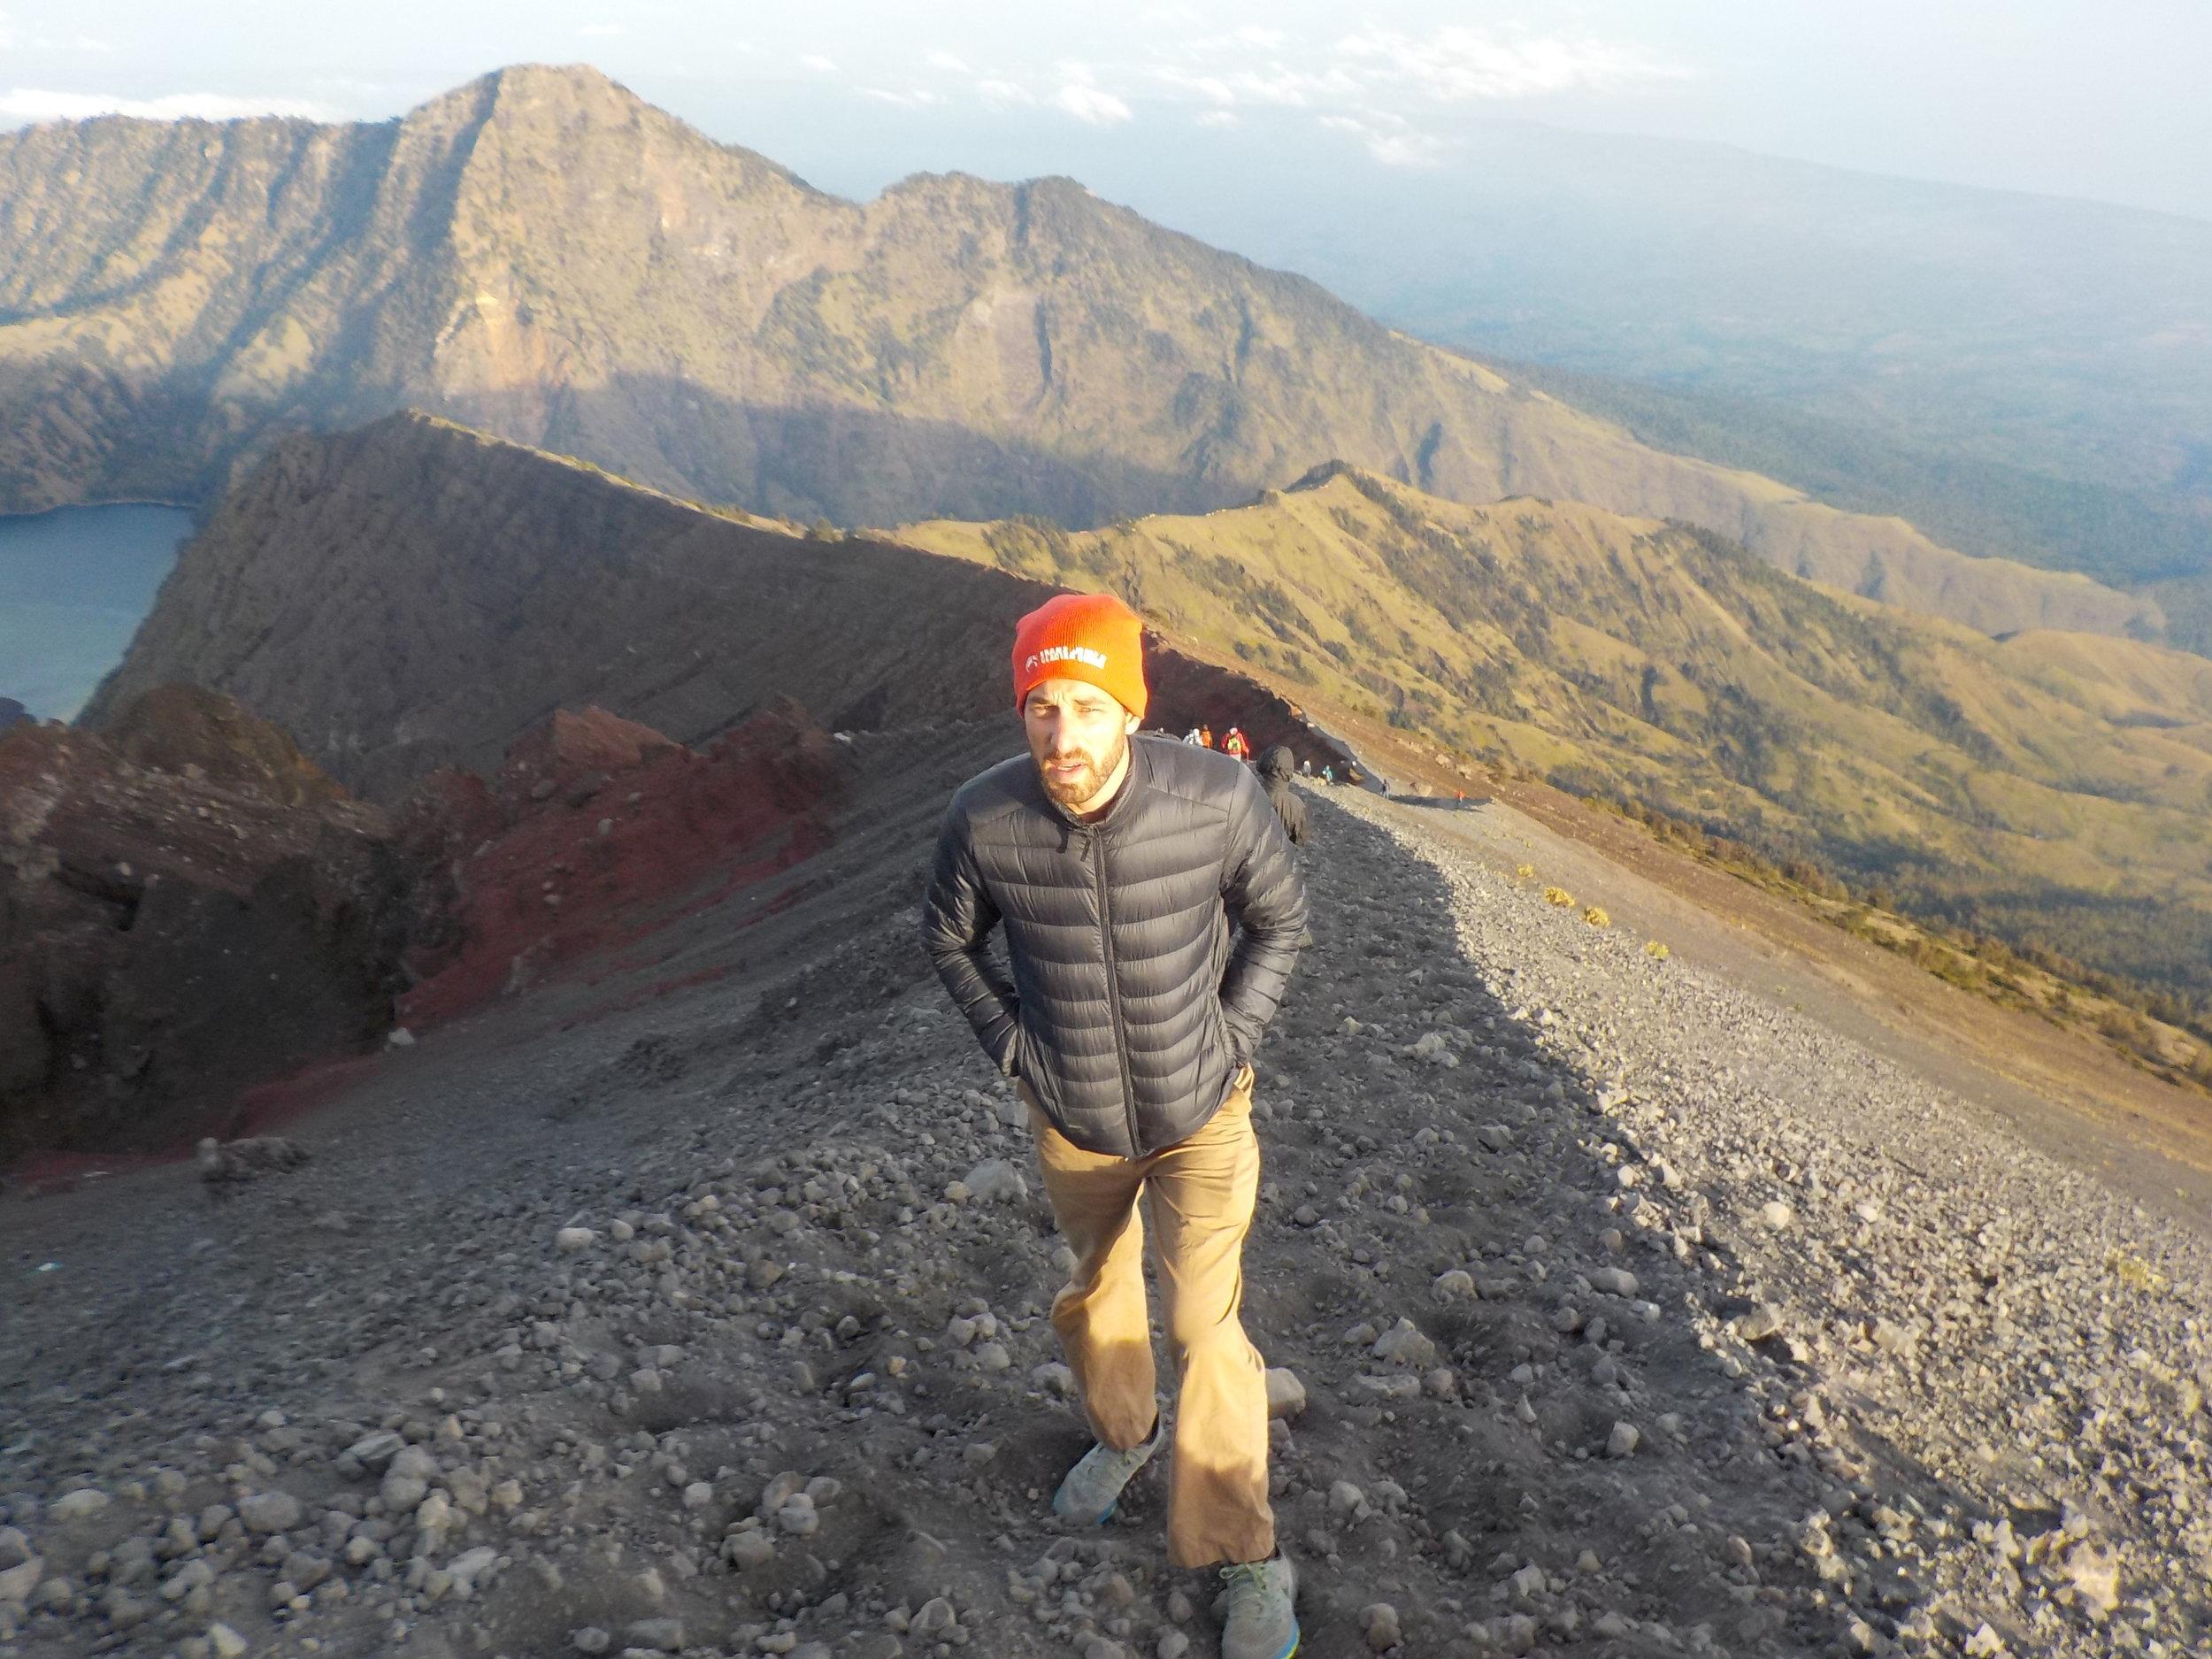 The Humbling Hike Up Mount Rinjani, Indonesia